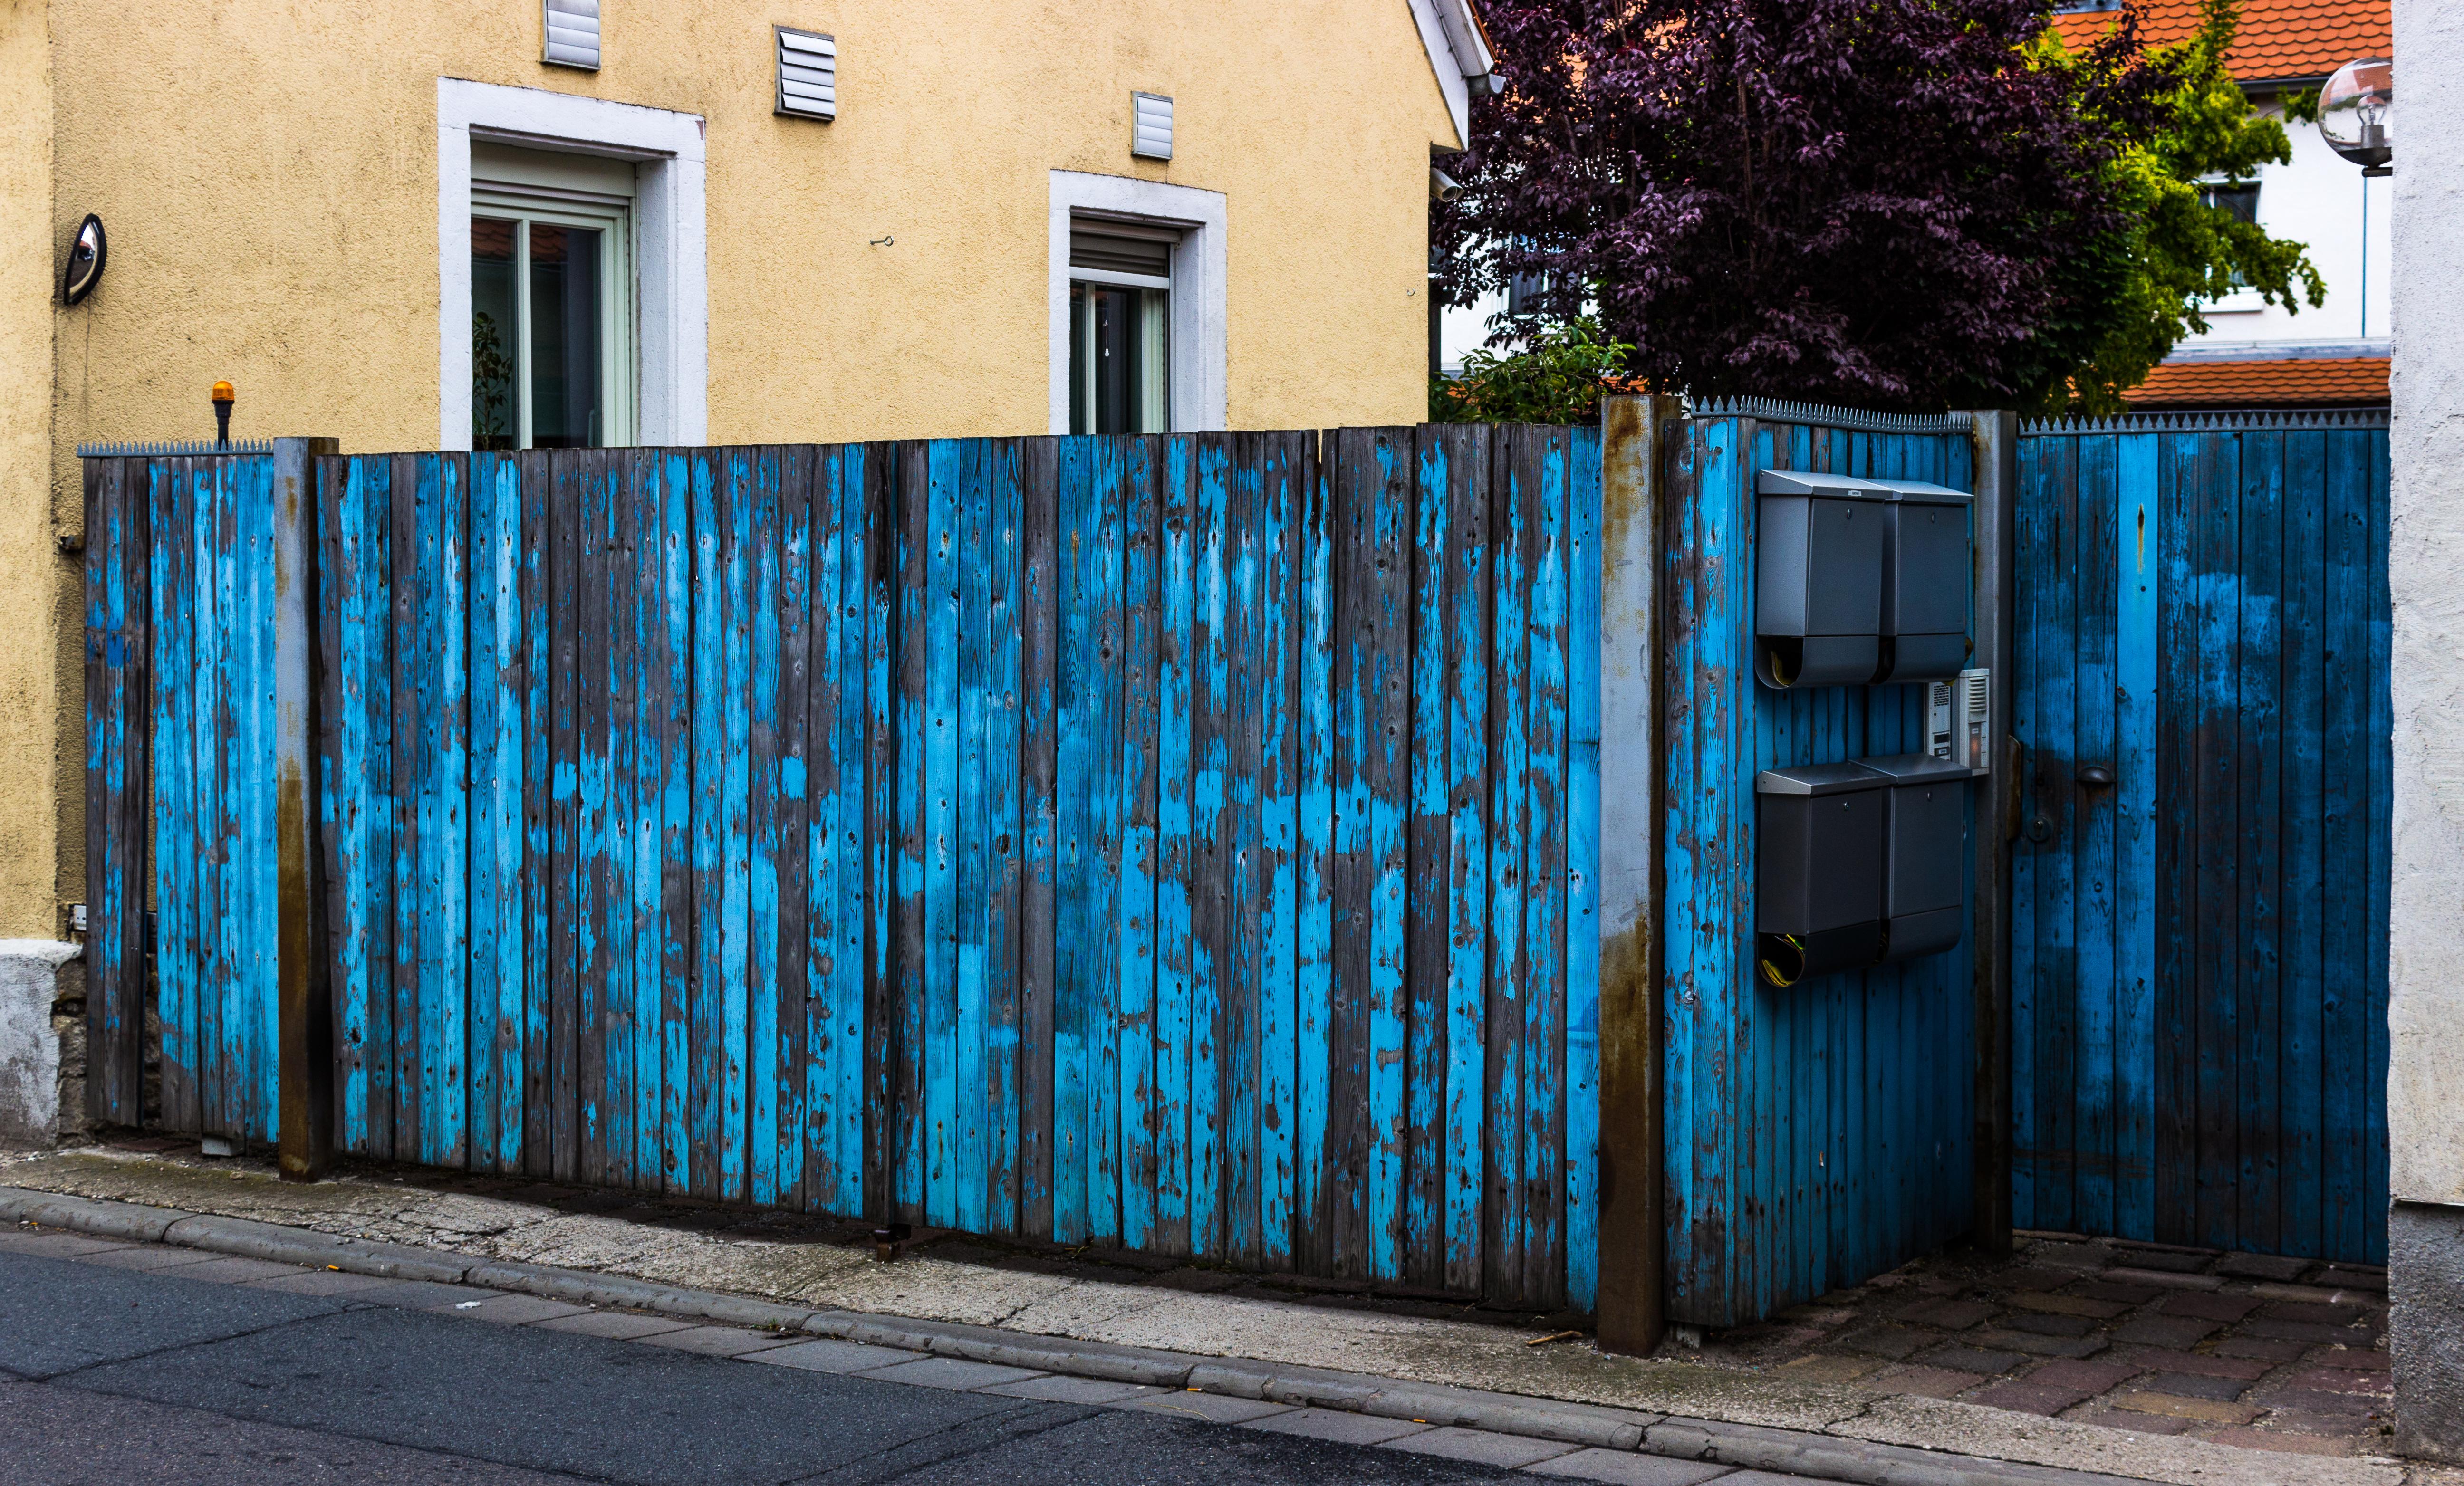 File:Alt Blau Holz-Zaun.jpg - Wikimedia Commons